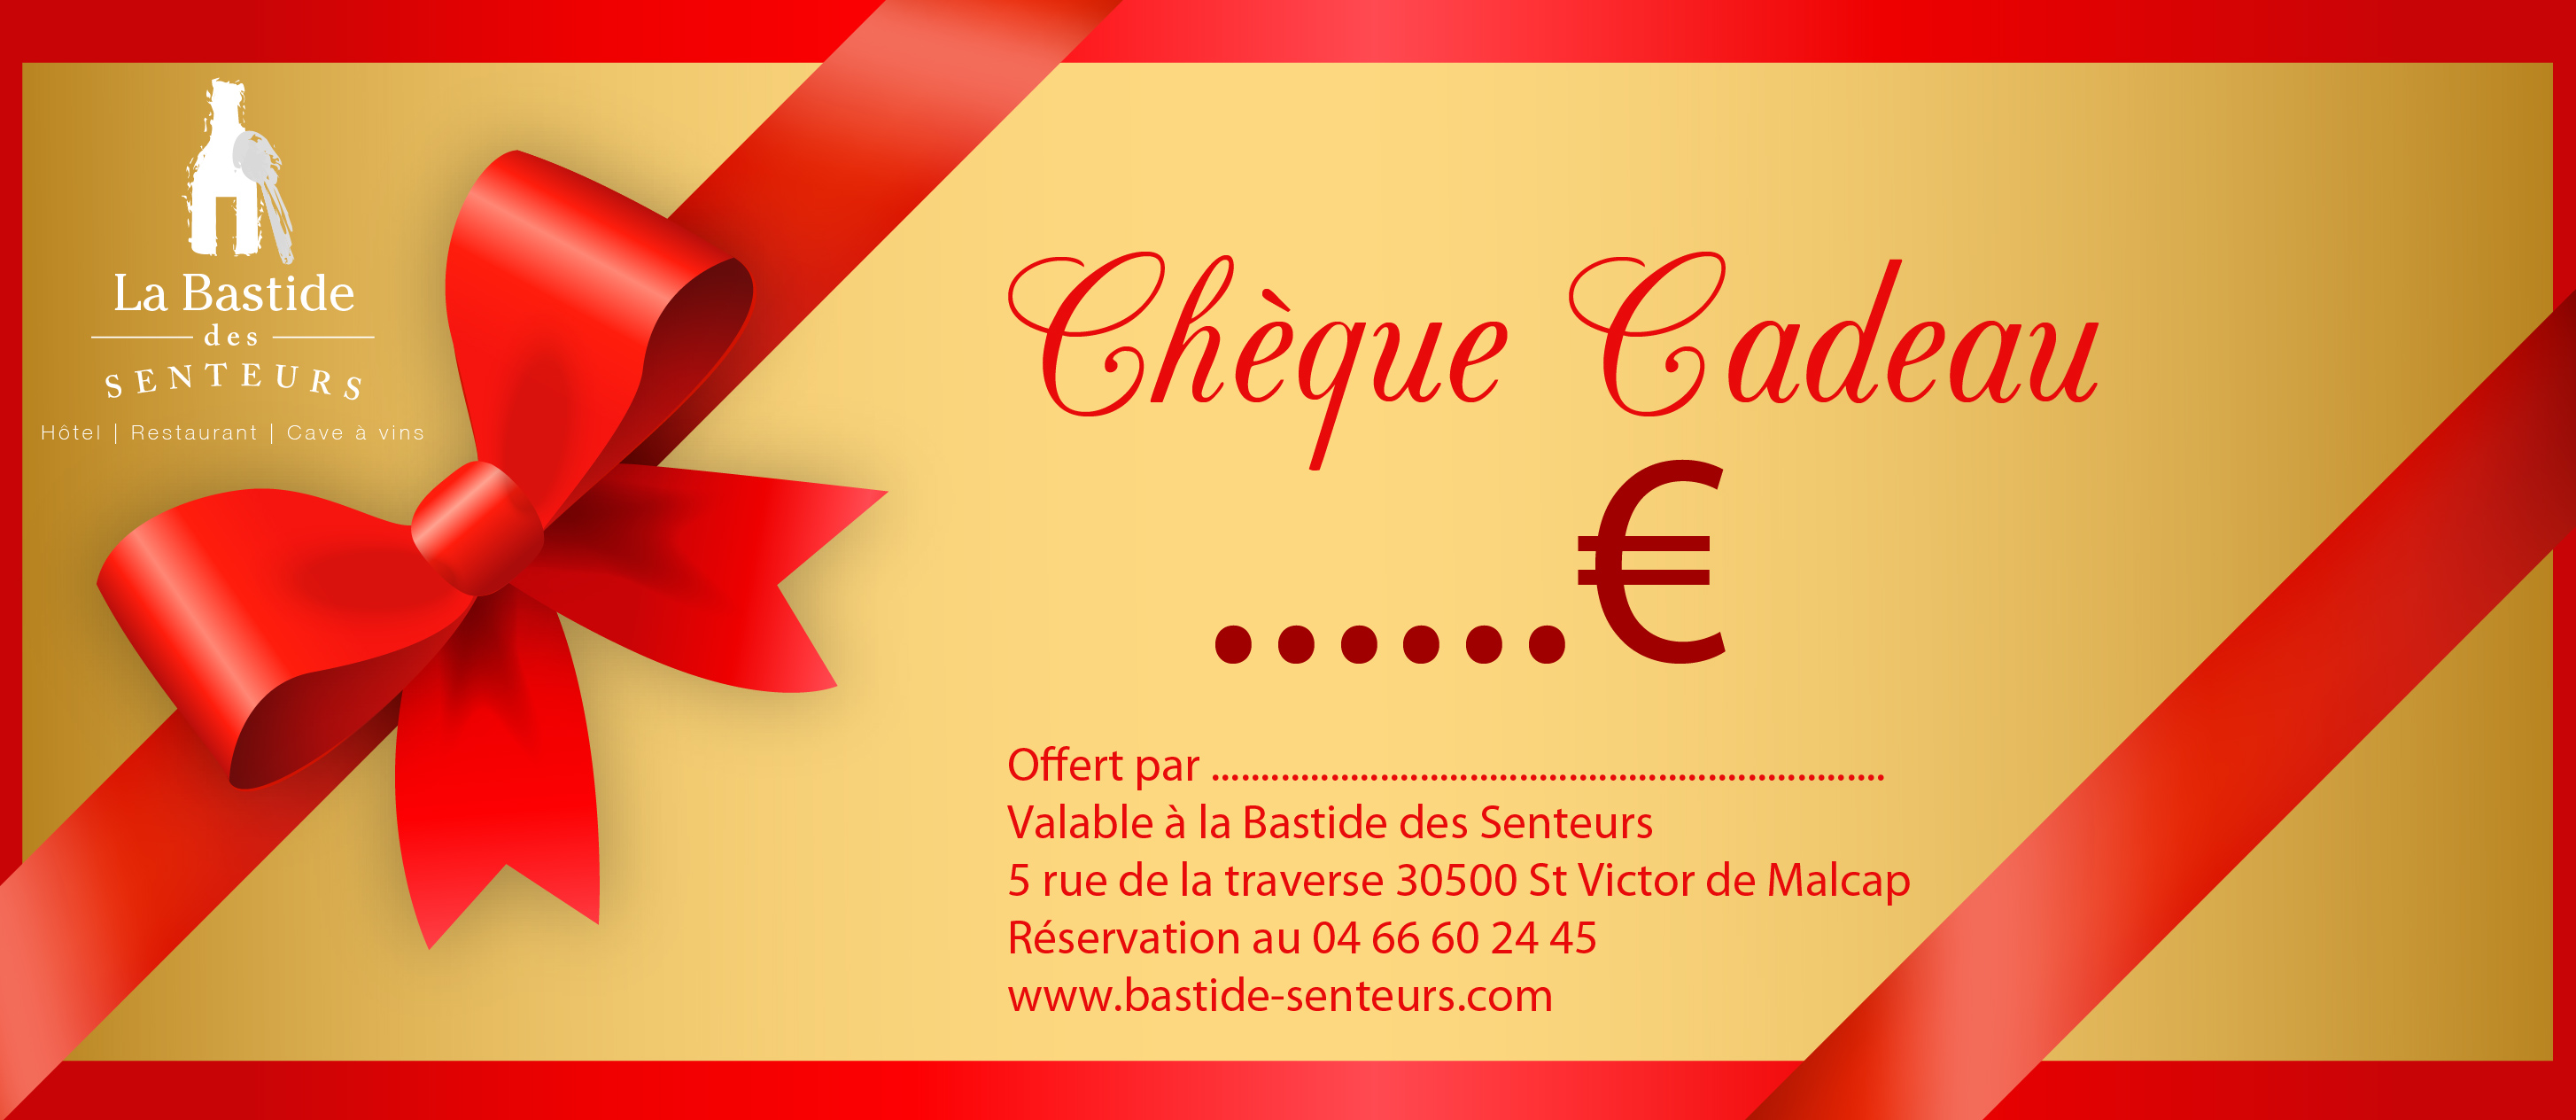 Restaurant Cheque Cadeau Gastronomique